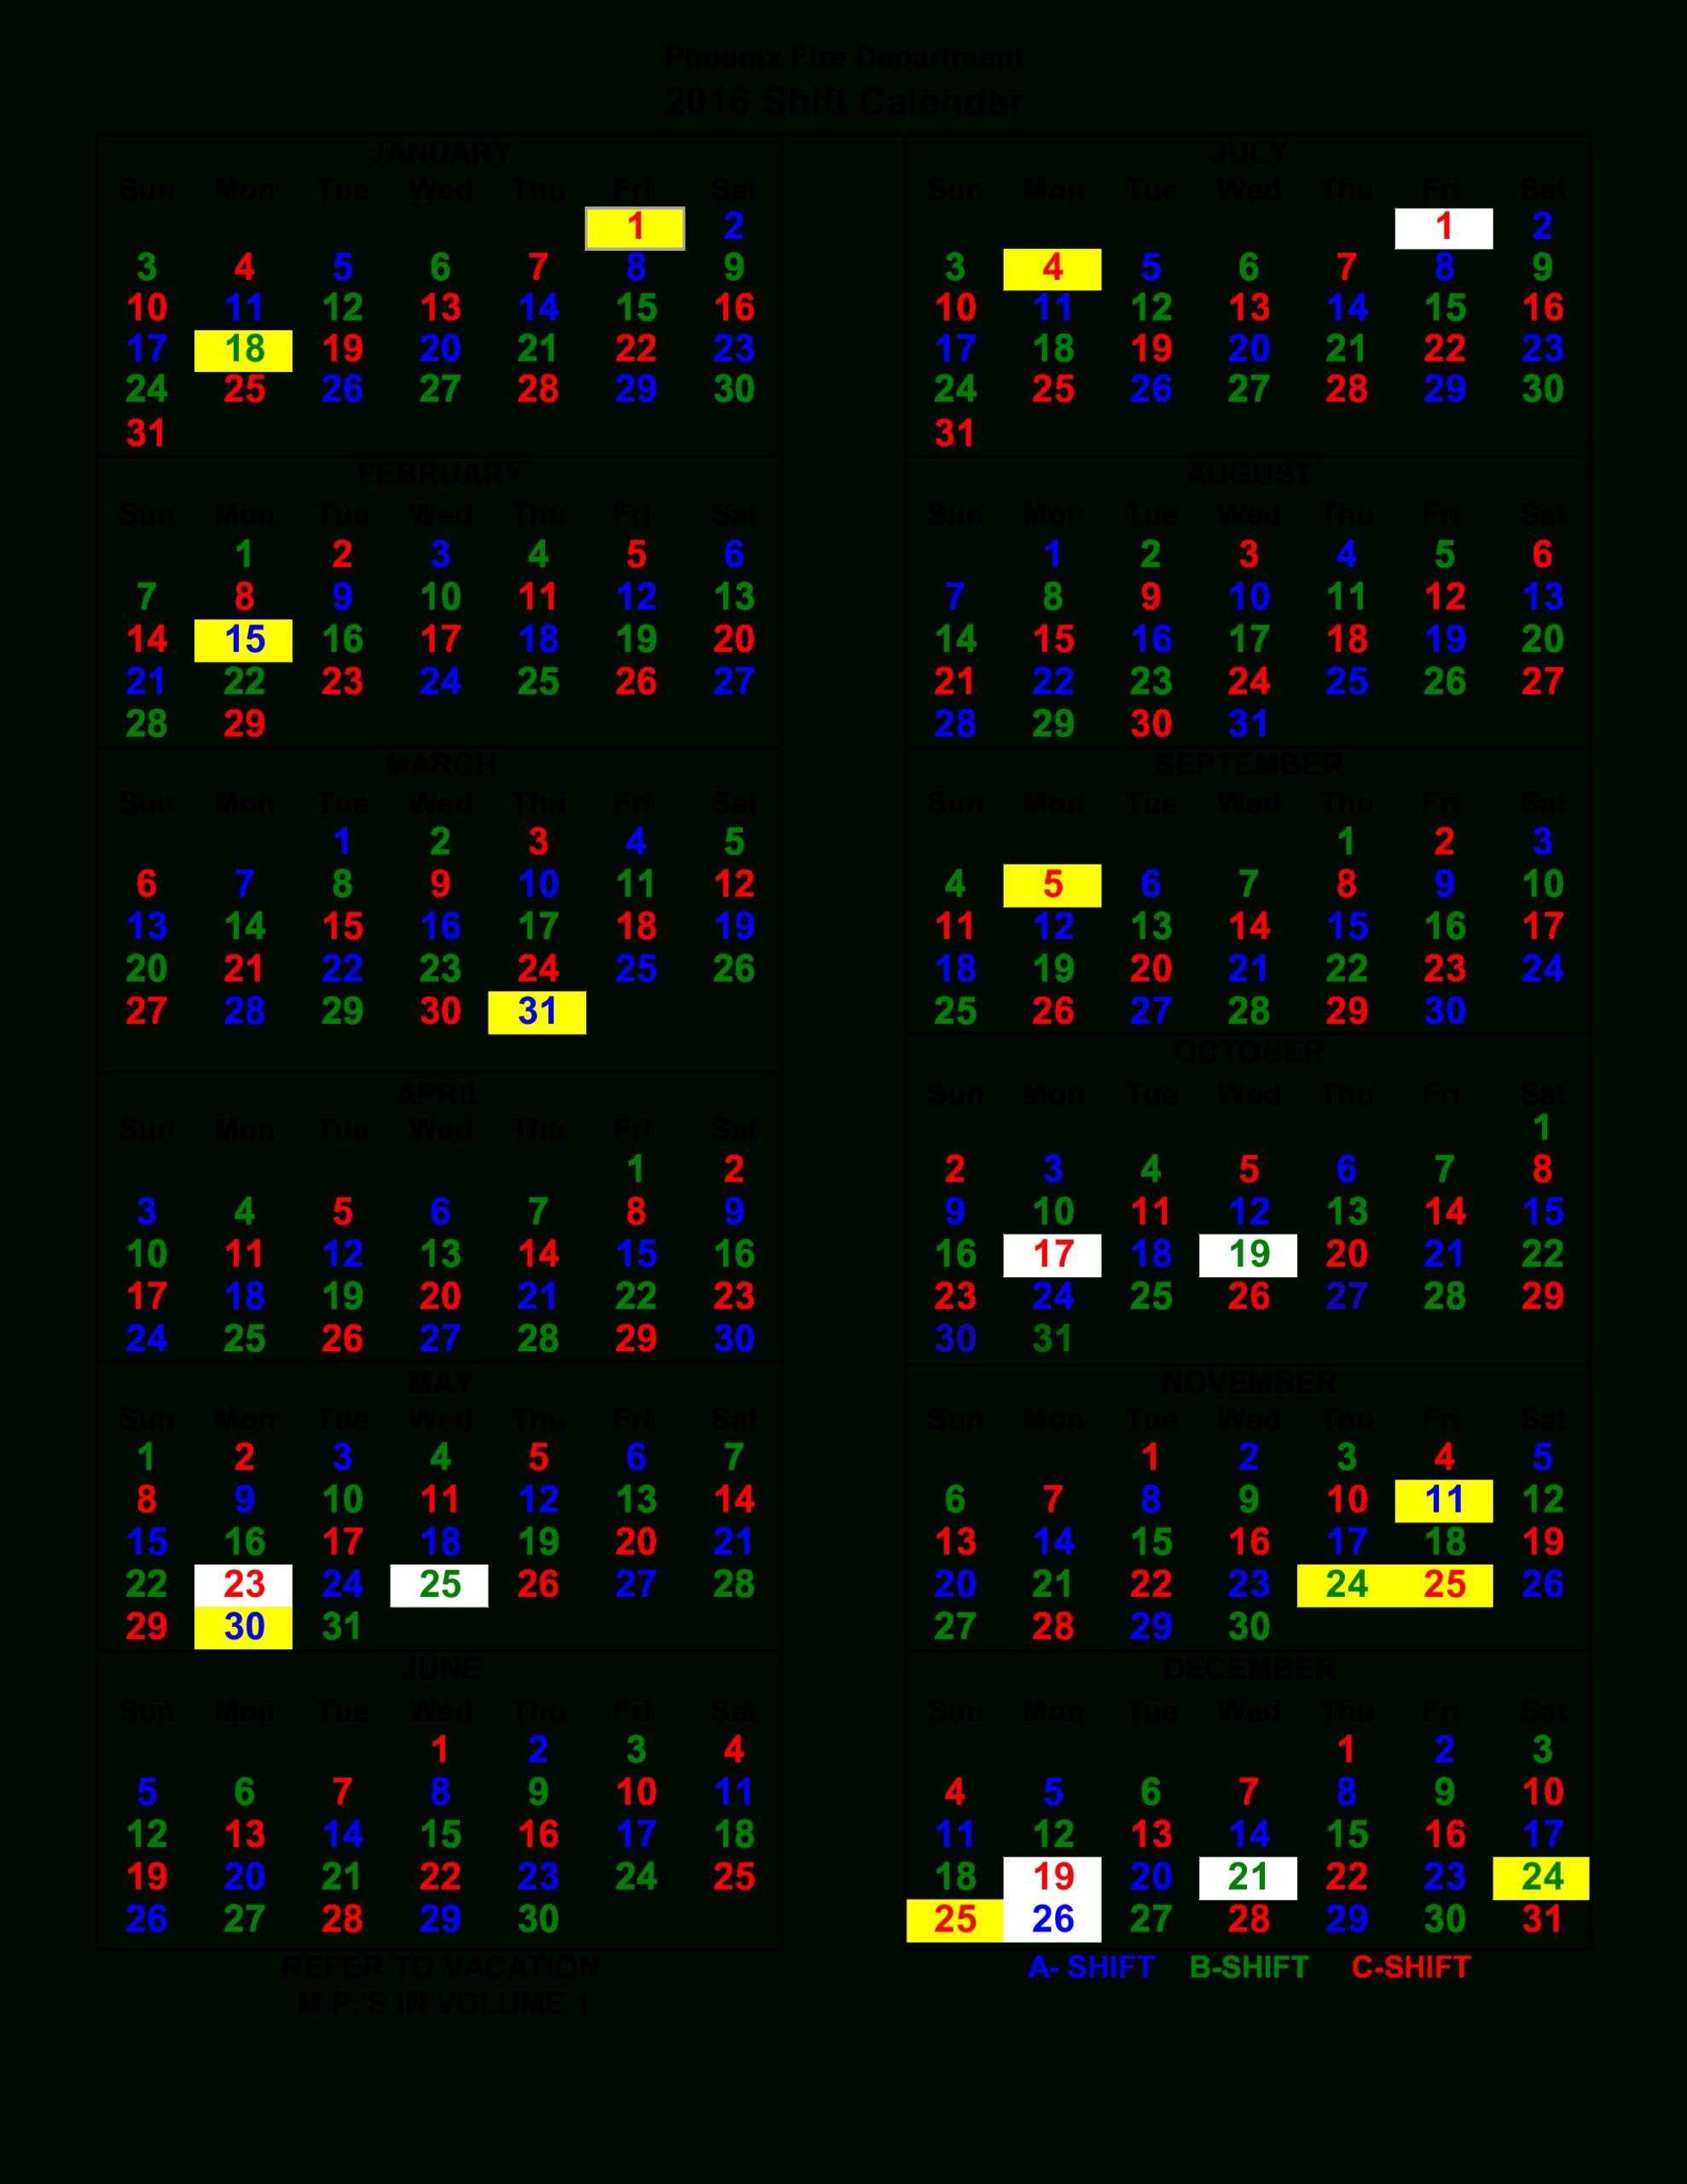 Shift Work Calendar Sample | Templates At